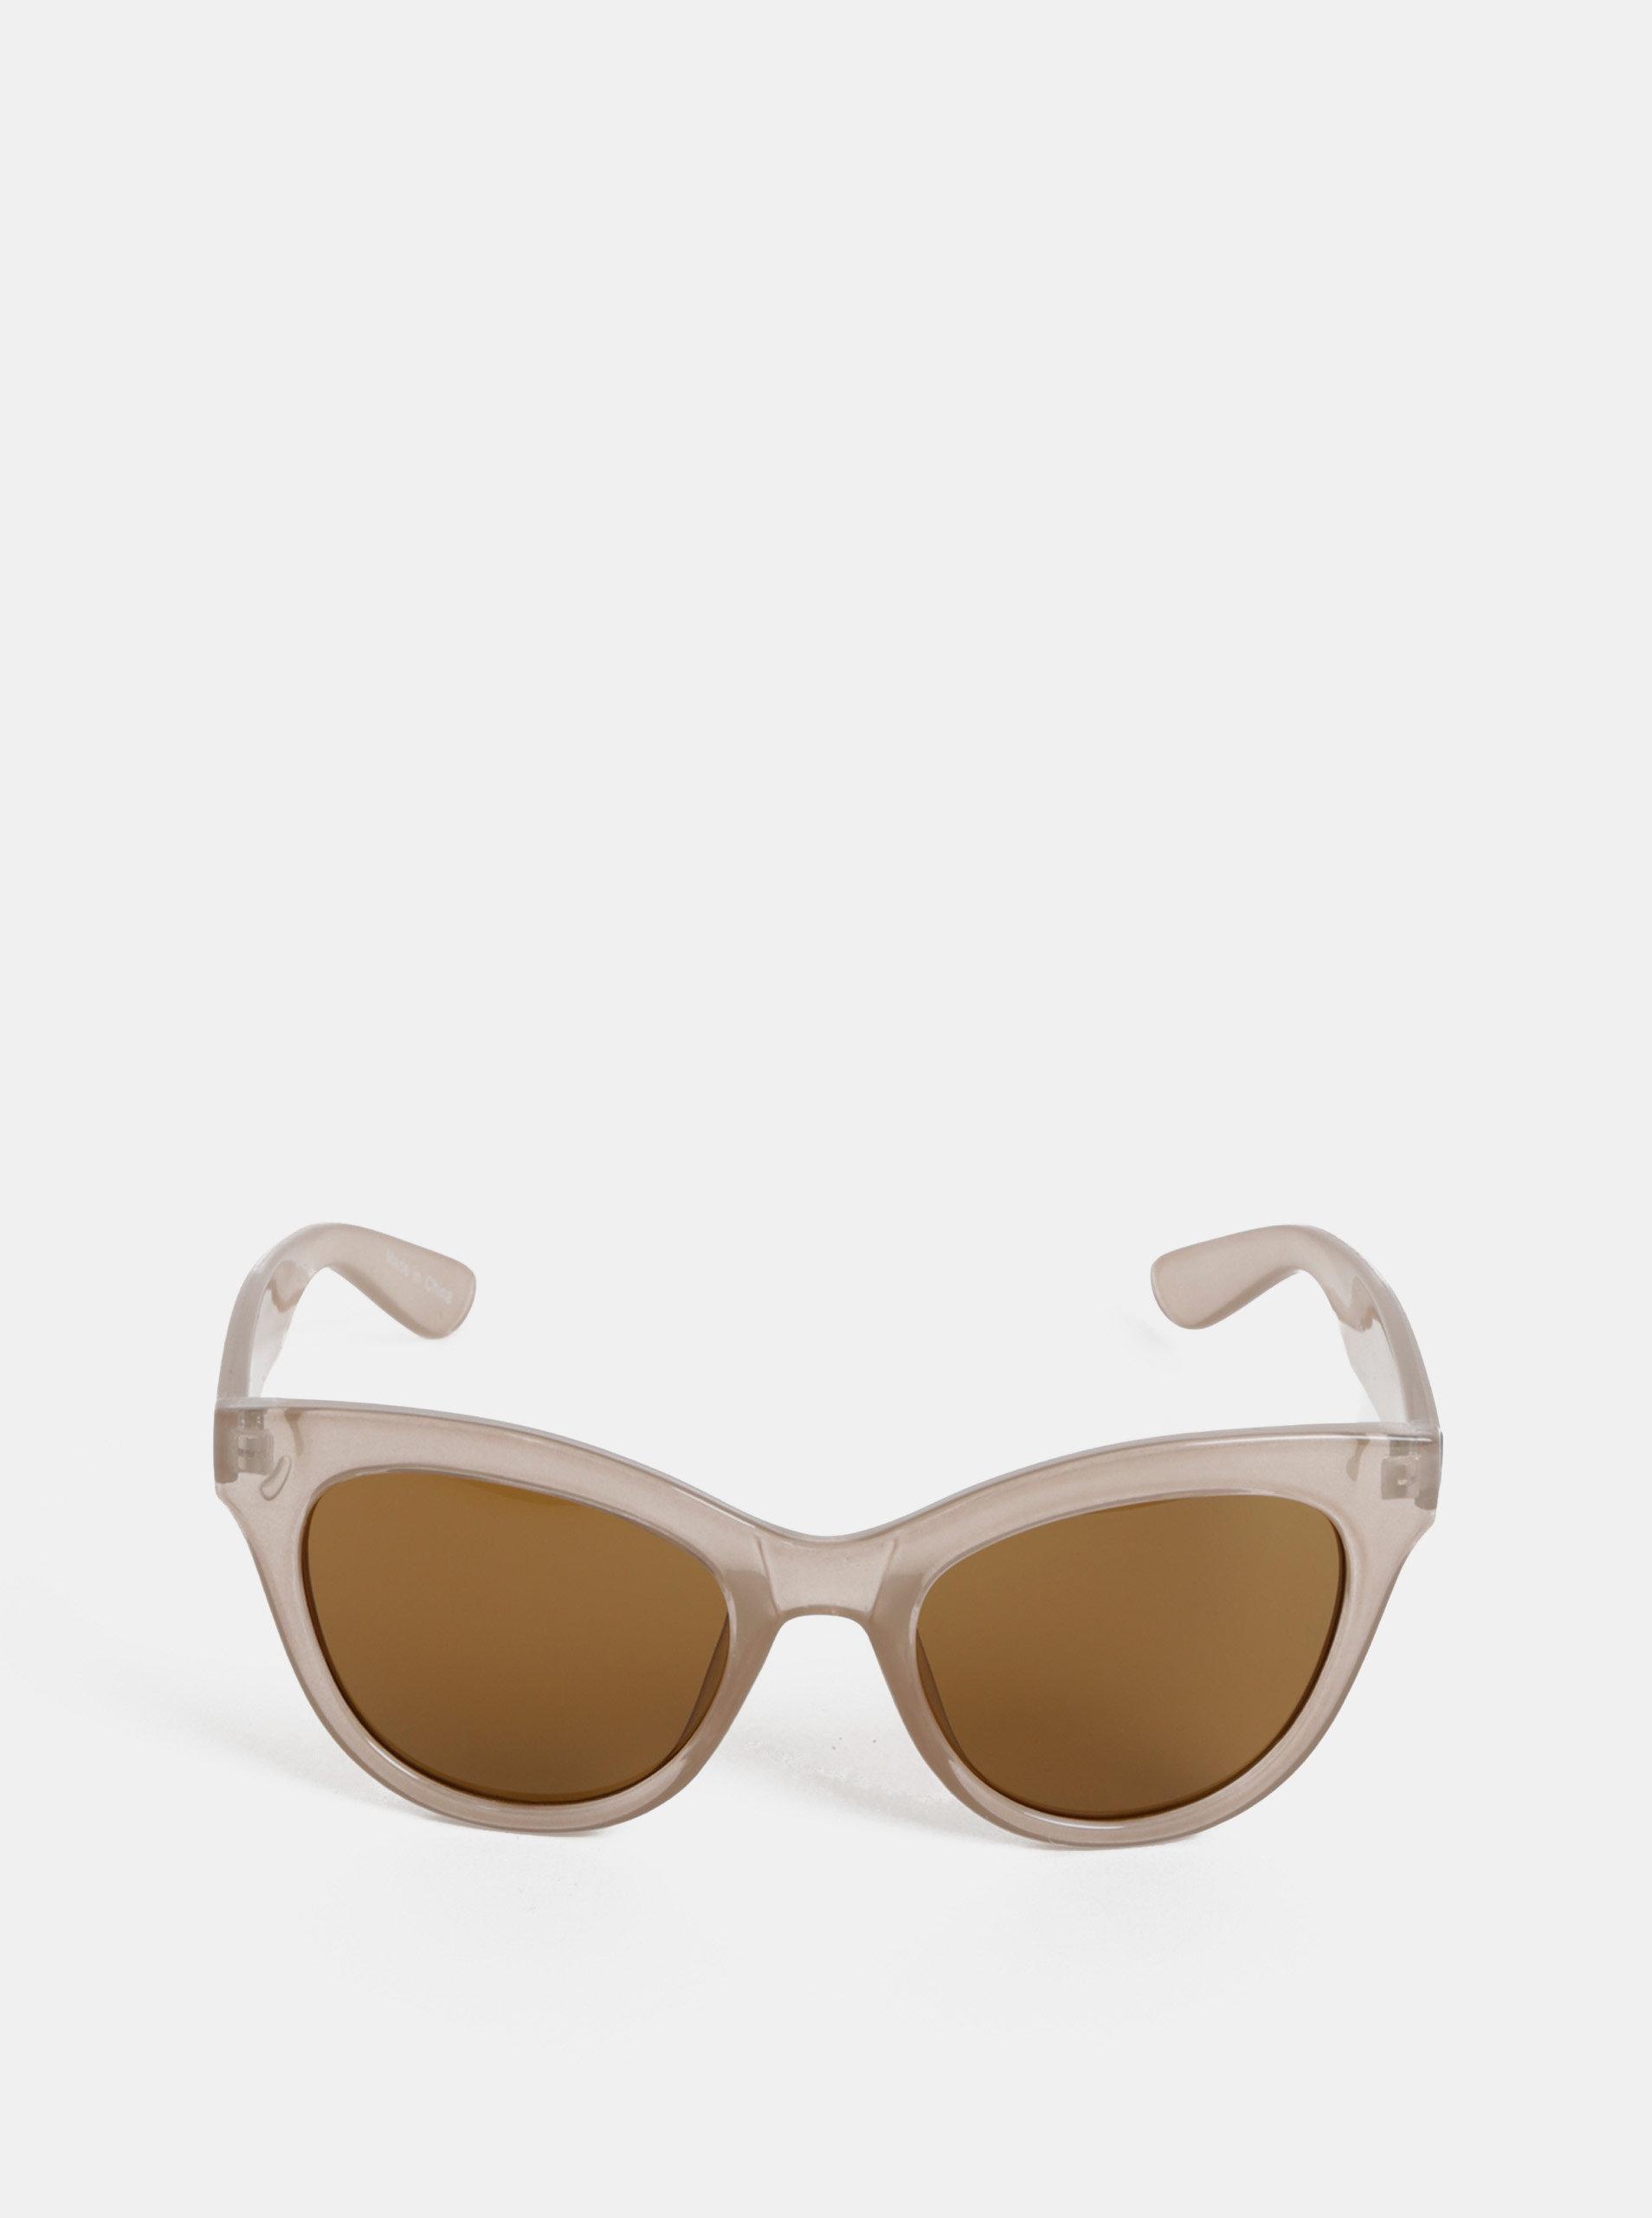 9202b8ece6 Béžové slnečné okuliare Pieces Sonja ...